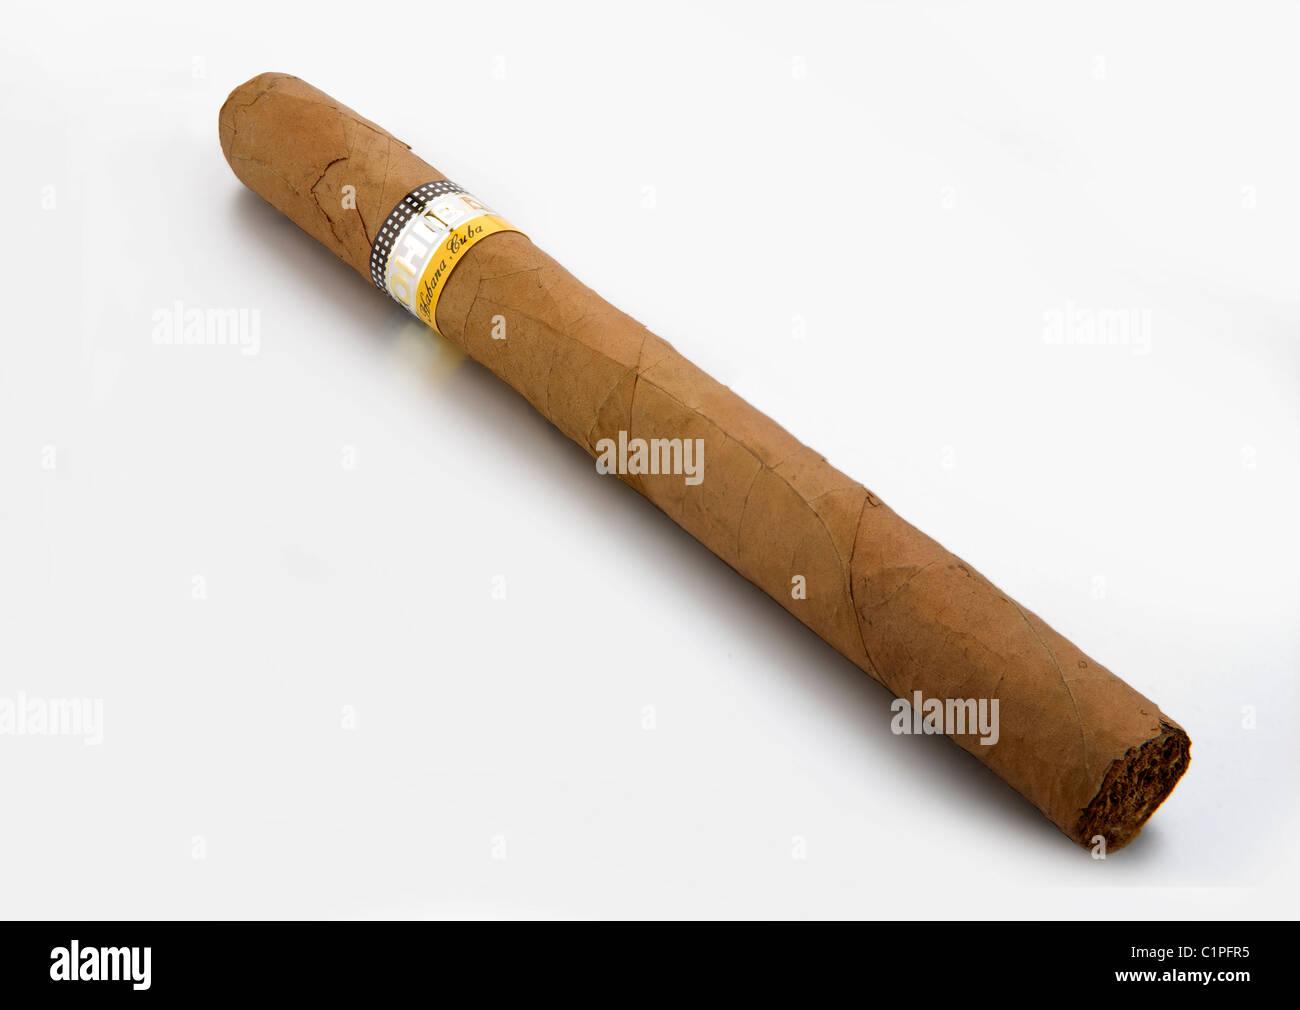 cuban cigar on white background - Stock Image